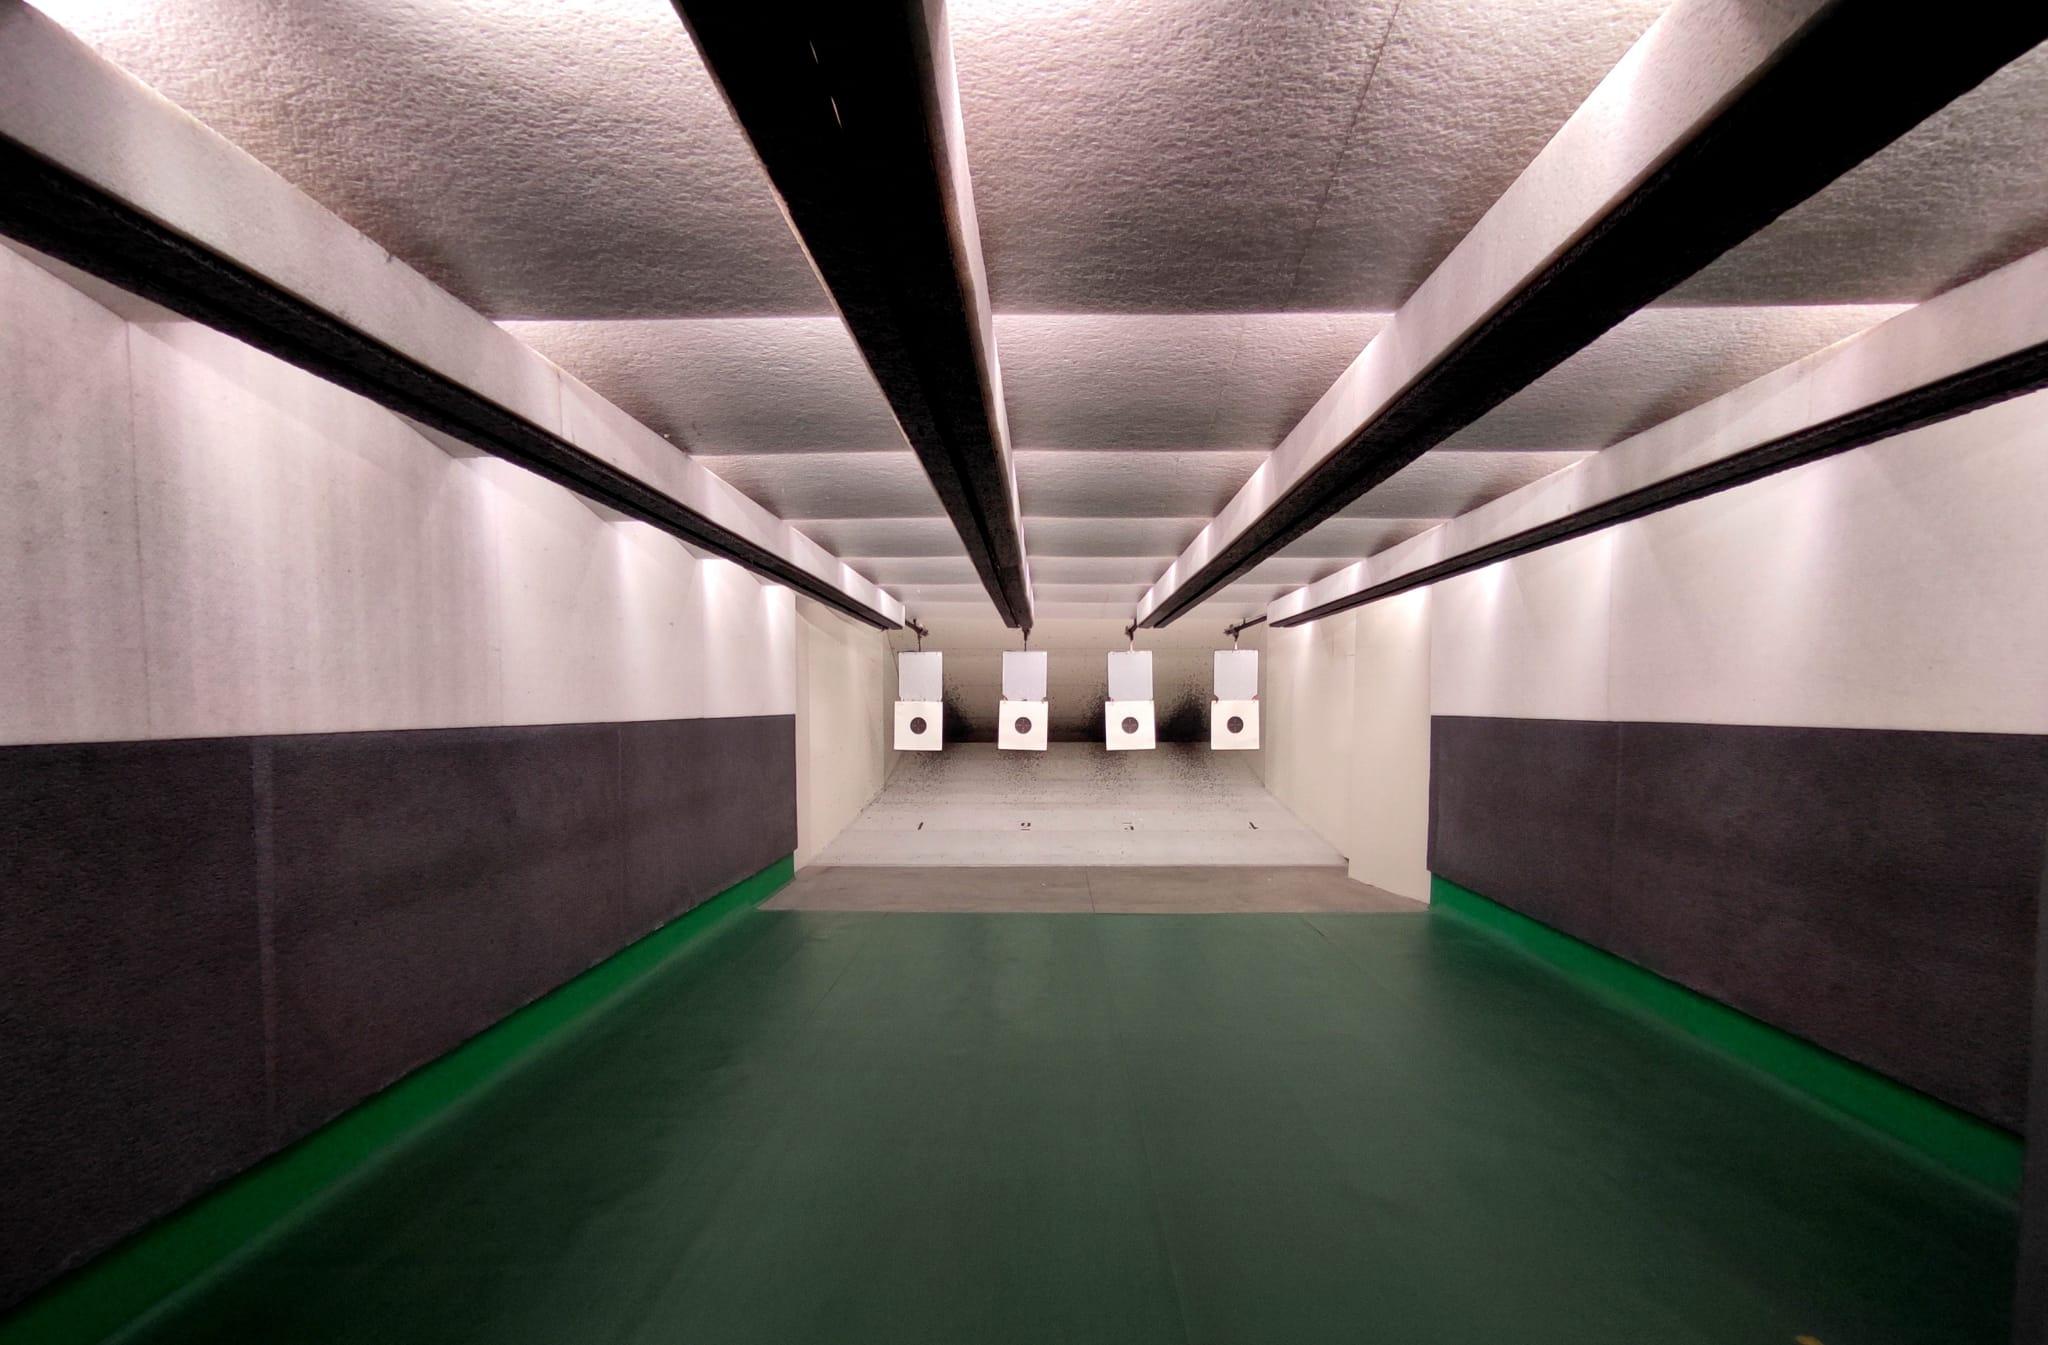 tunnel 15 mt tsn monza